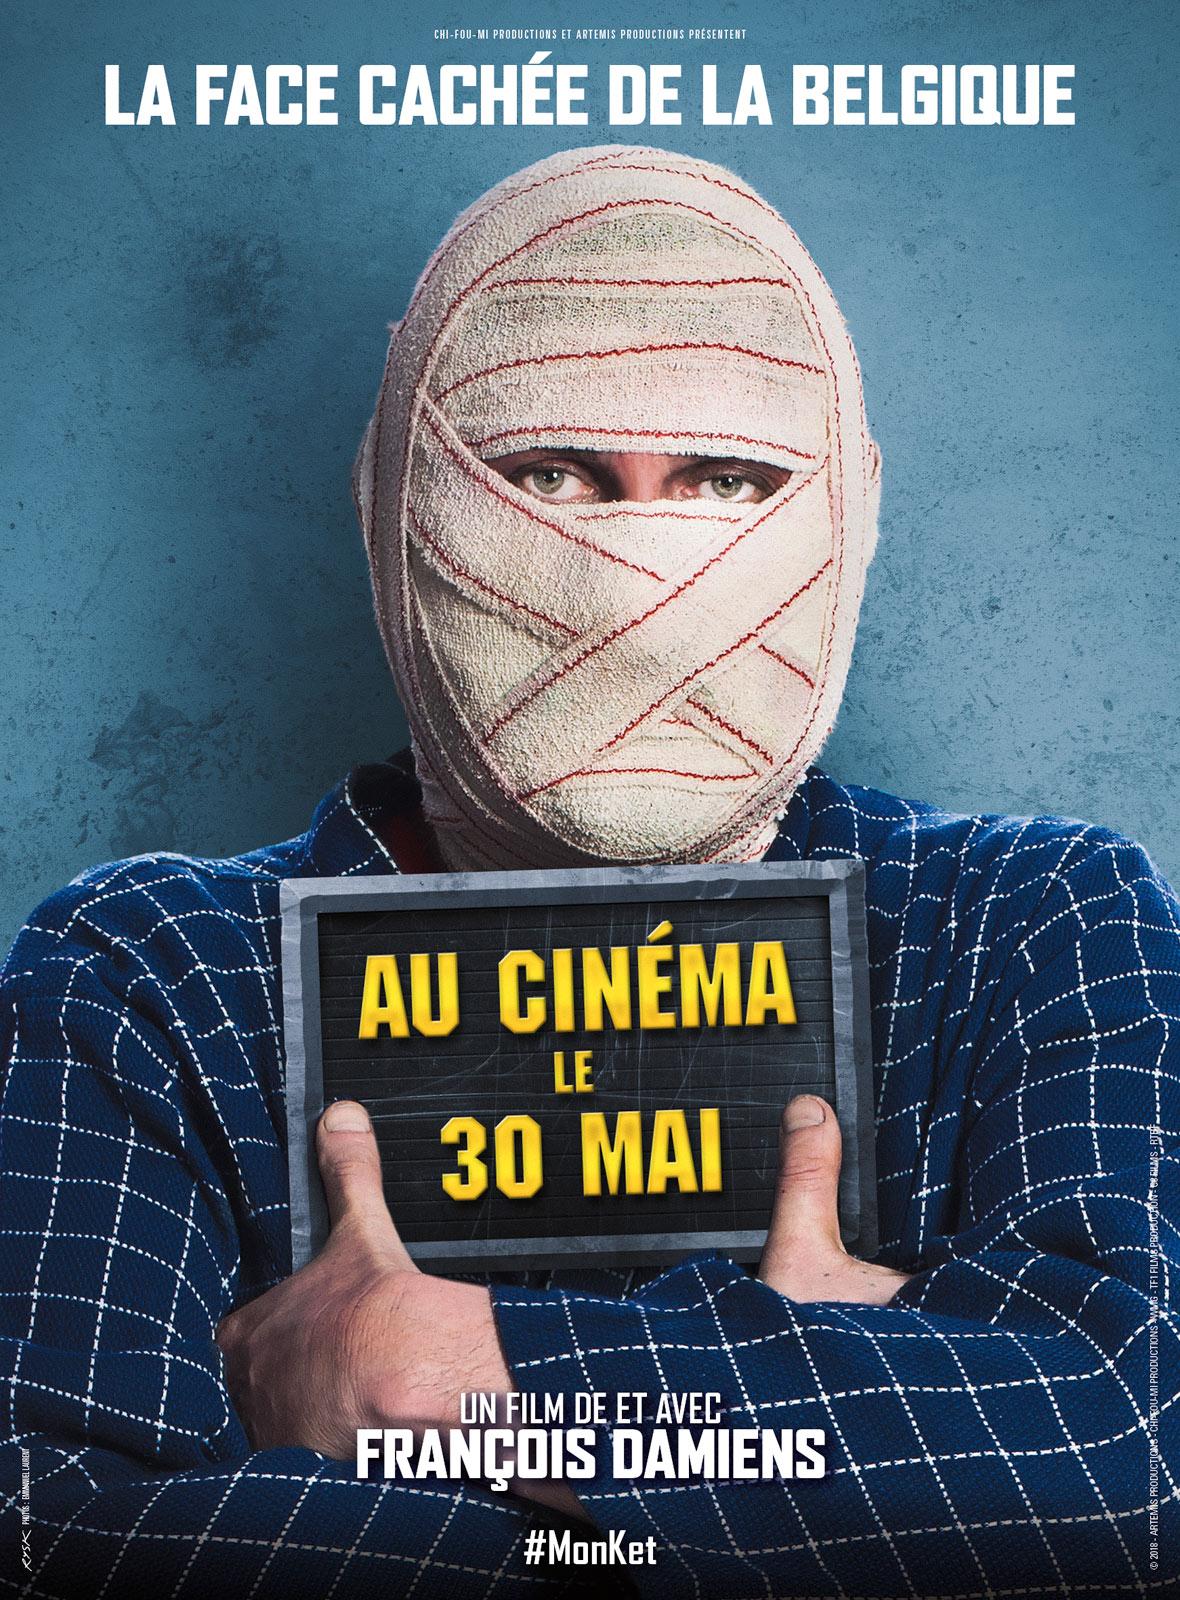 Image du film Mon Ket